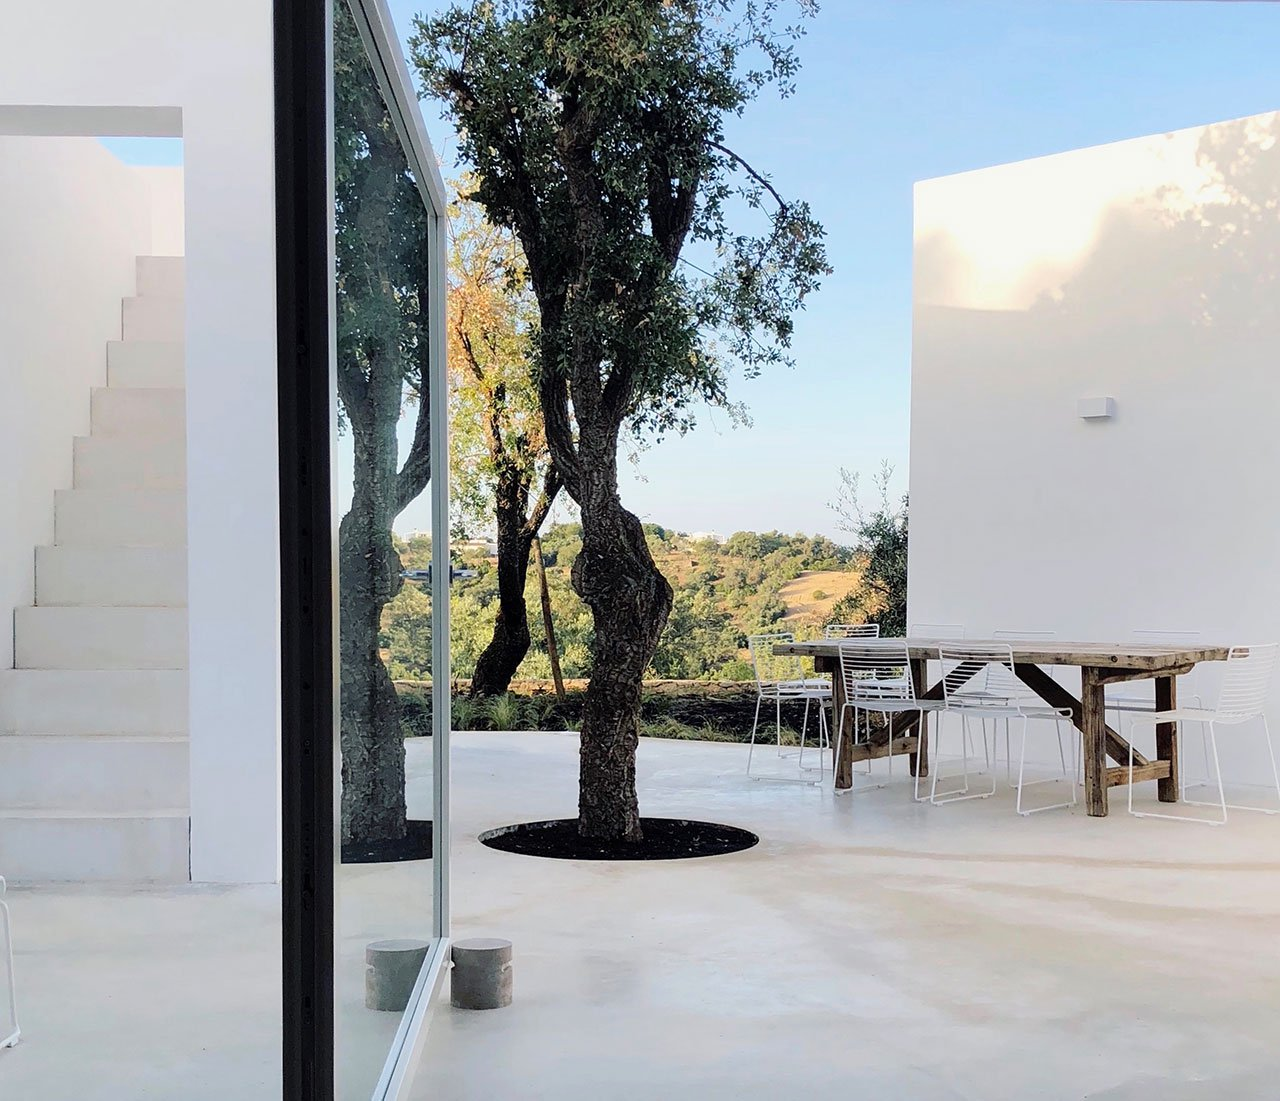 casa-luum-minimalizmus-a-portugal-videken-noko-024.jpg